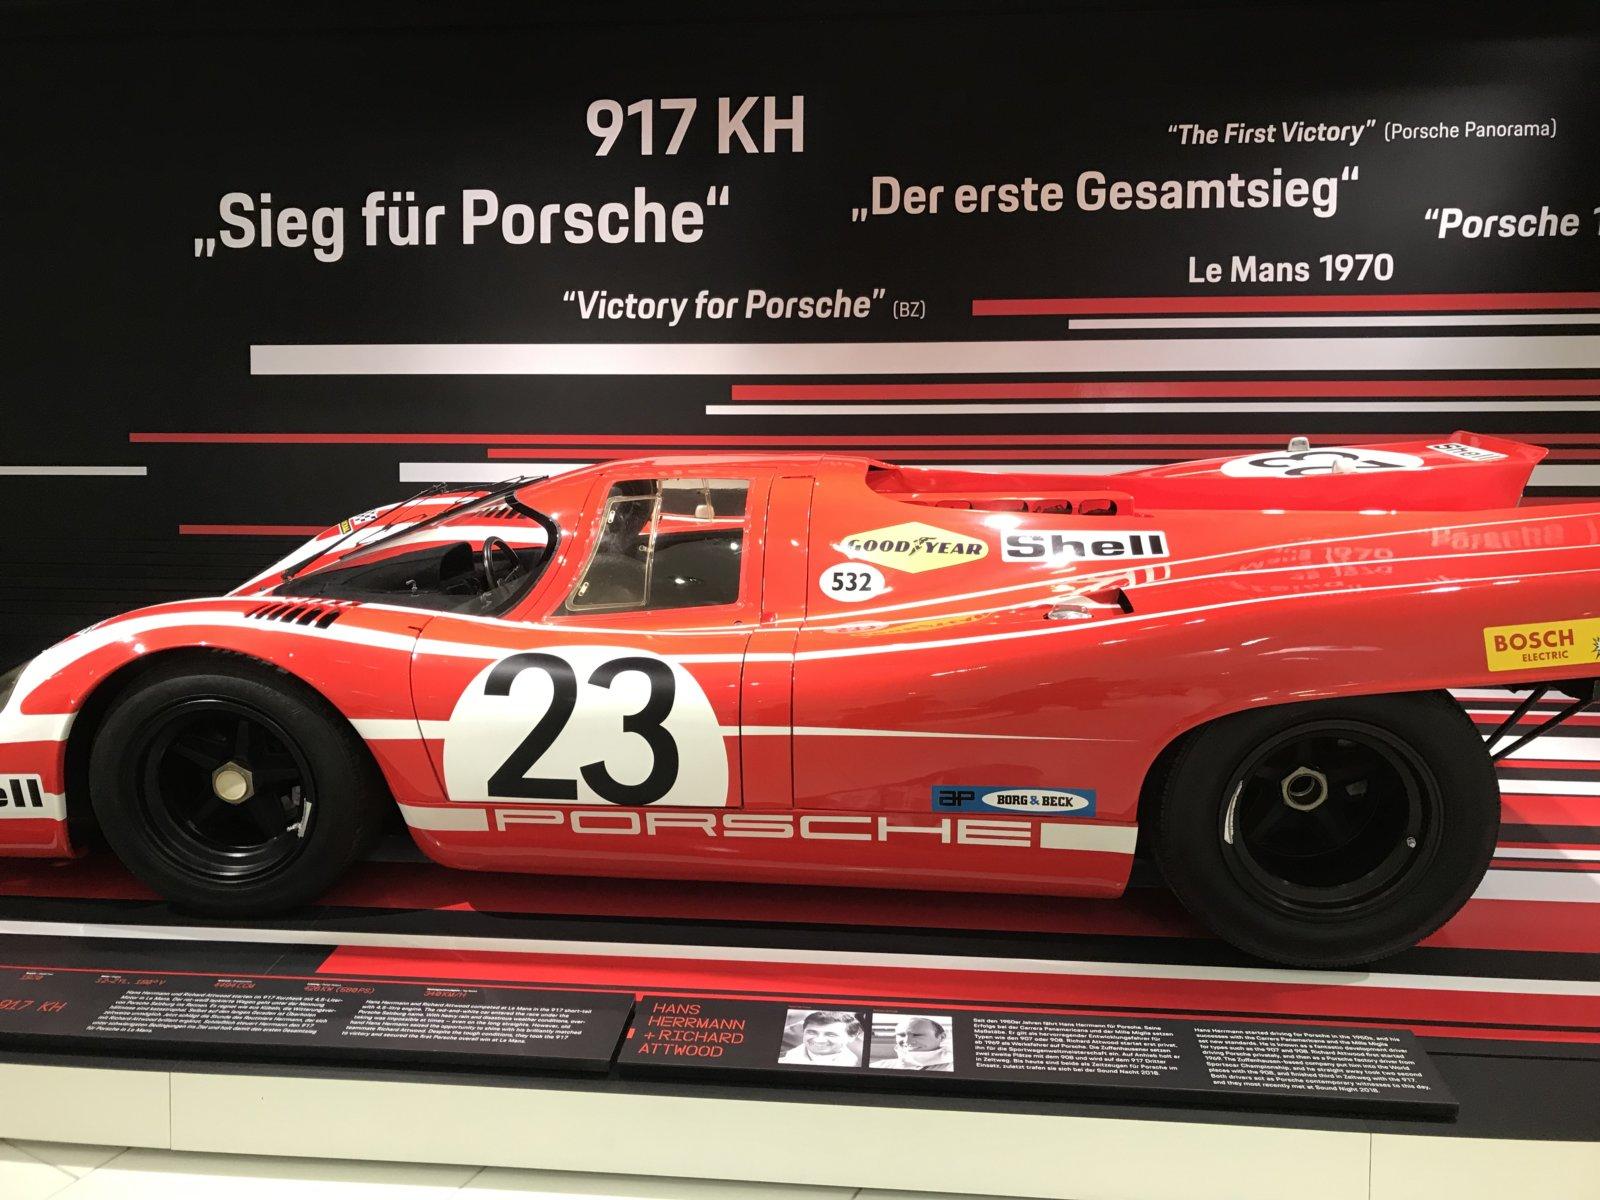 07-28 Porsche Race Car 02